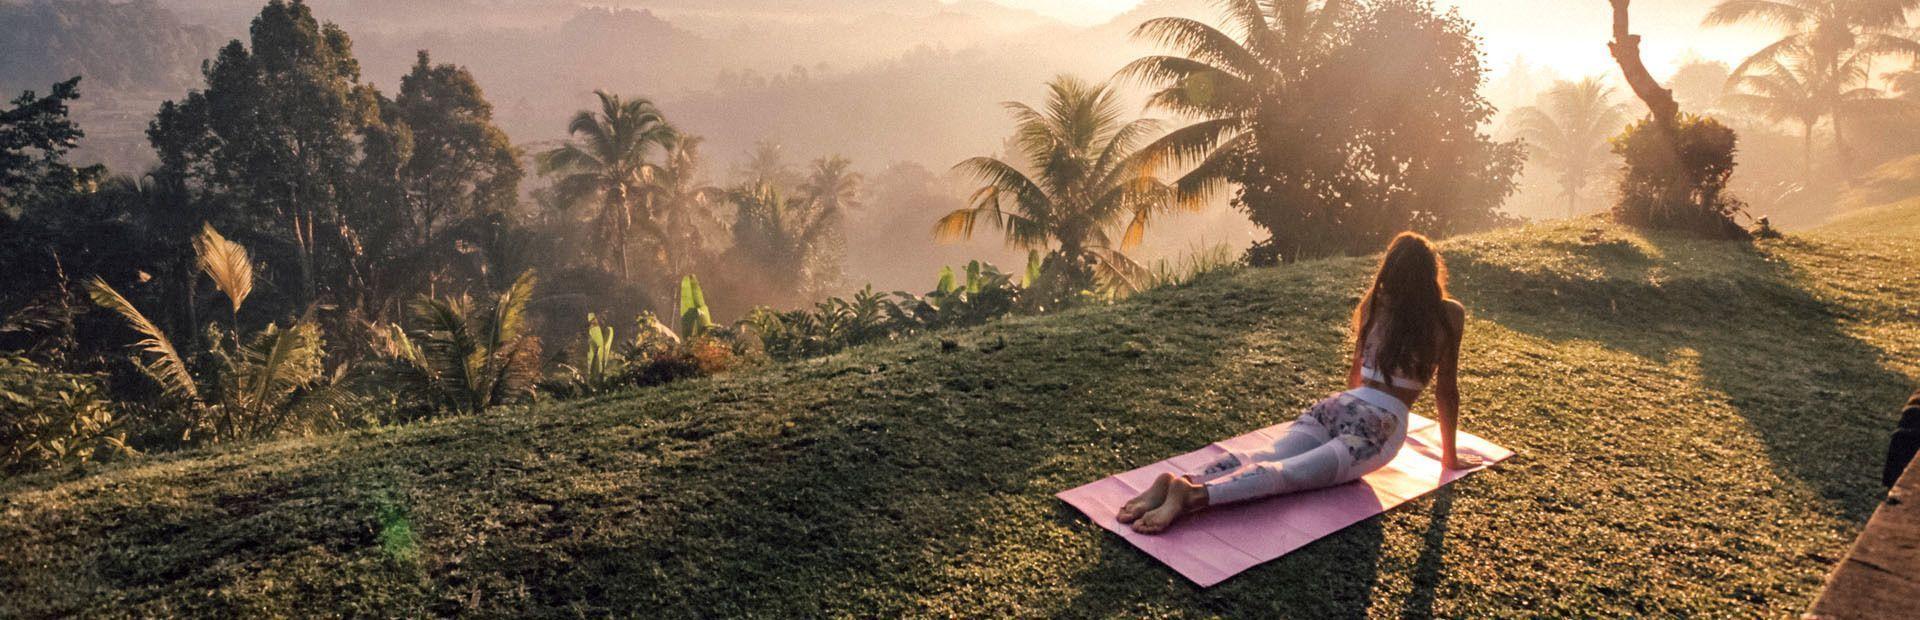 Bali Lombok: Yoga e Meditazione